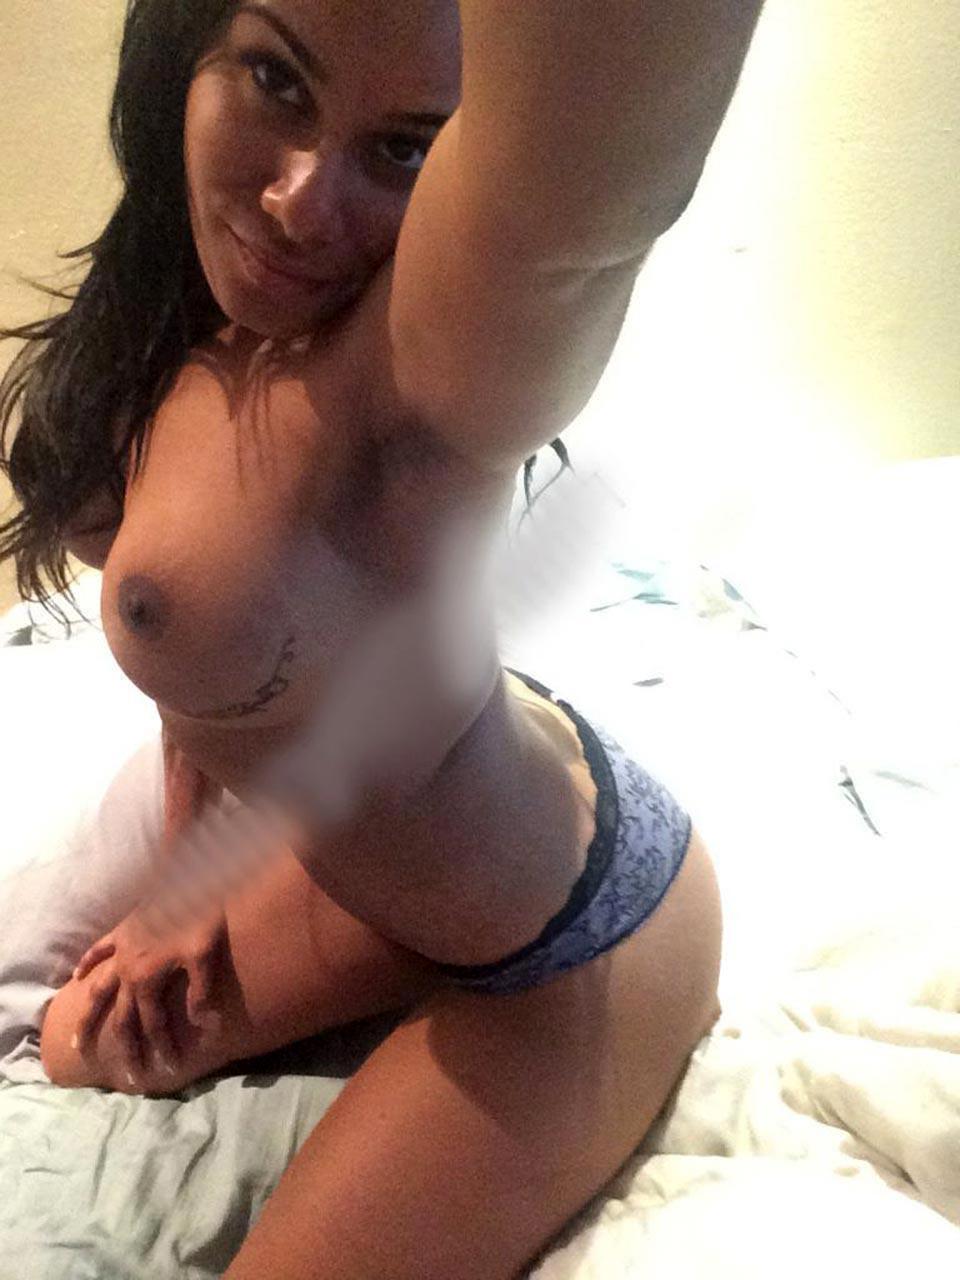 Redneck sluts women hot pink thong